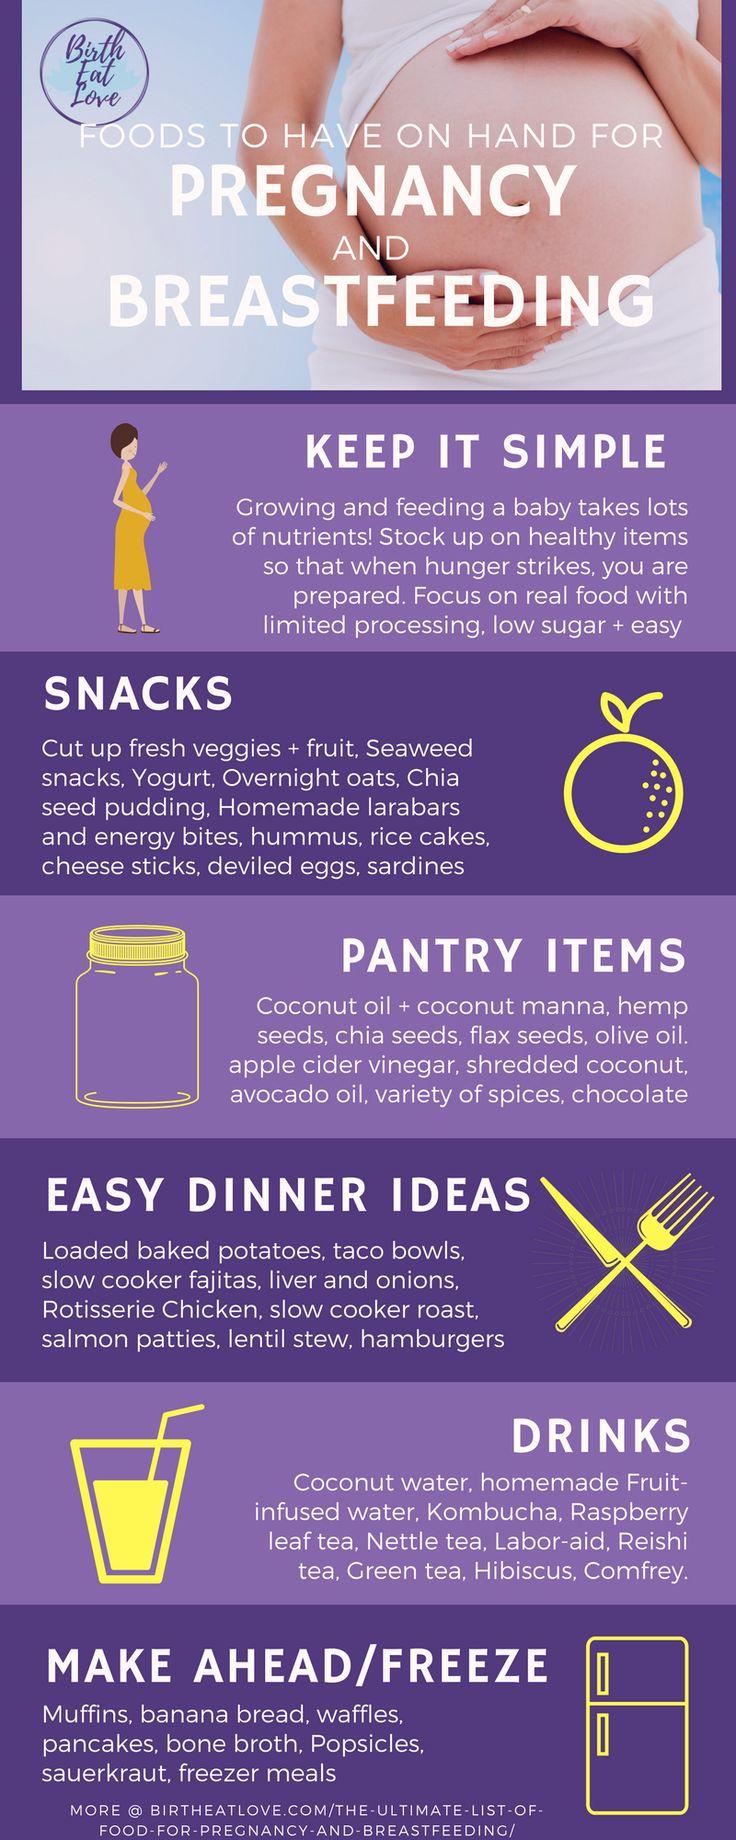 25+ best ideas about Healthy Pregnancy Diet on Pinterest ...